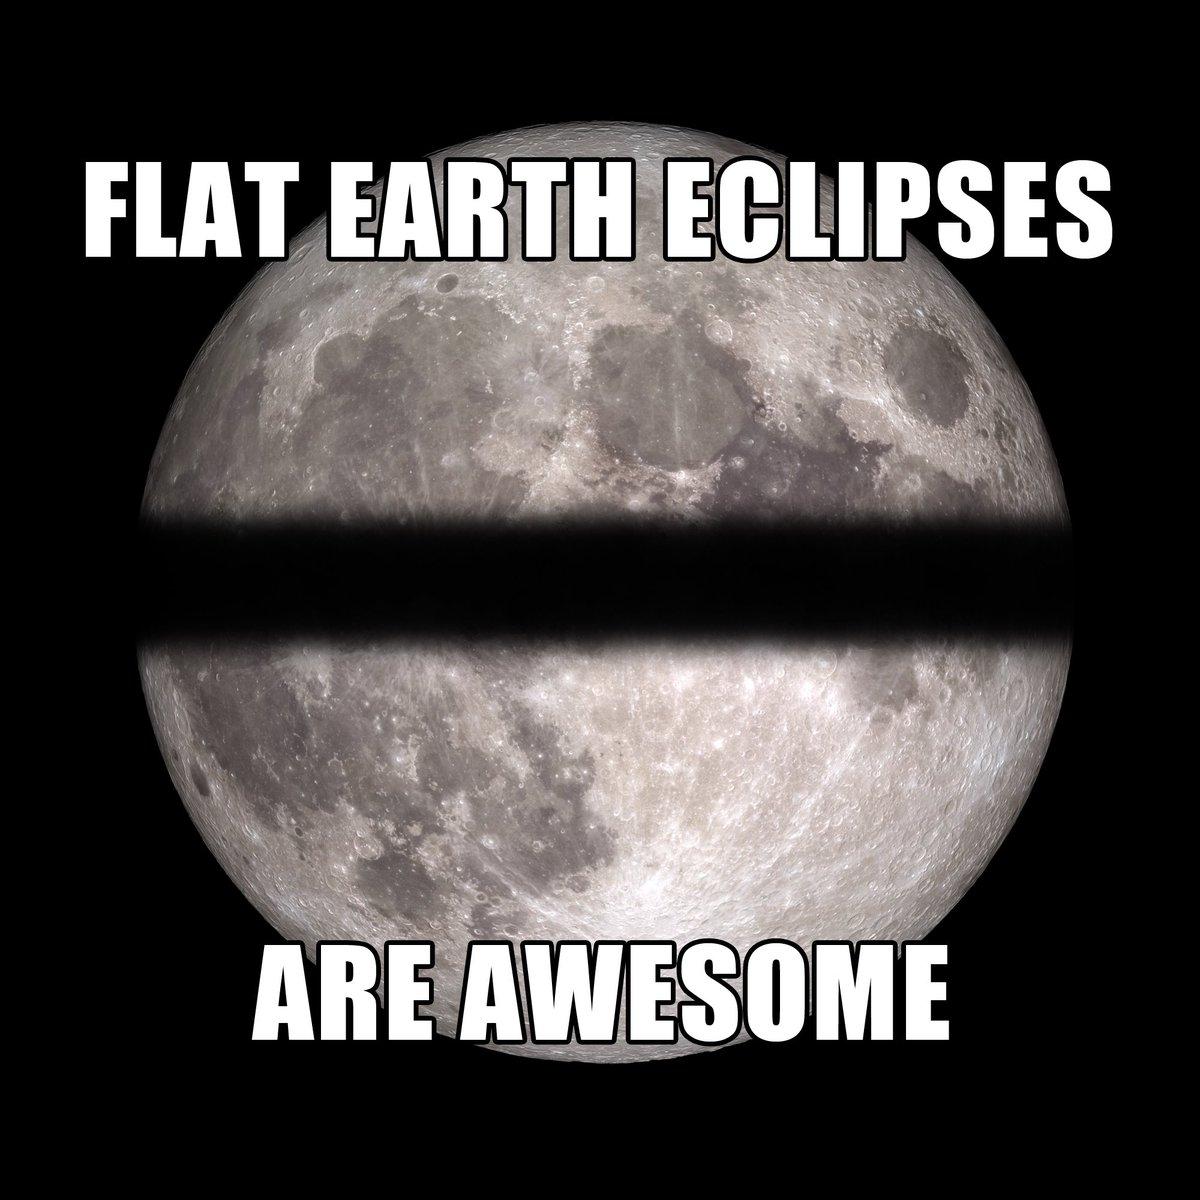 Enjoy the lunar eclipse tonight, Flat Earthers!